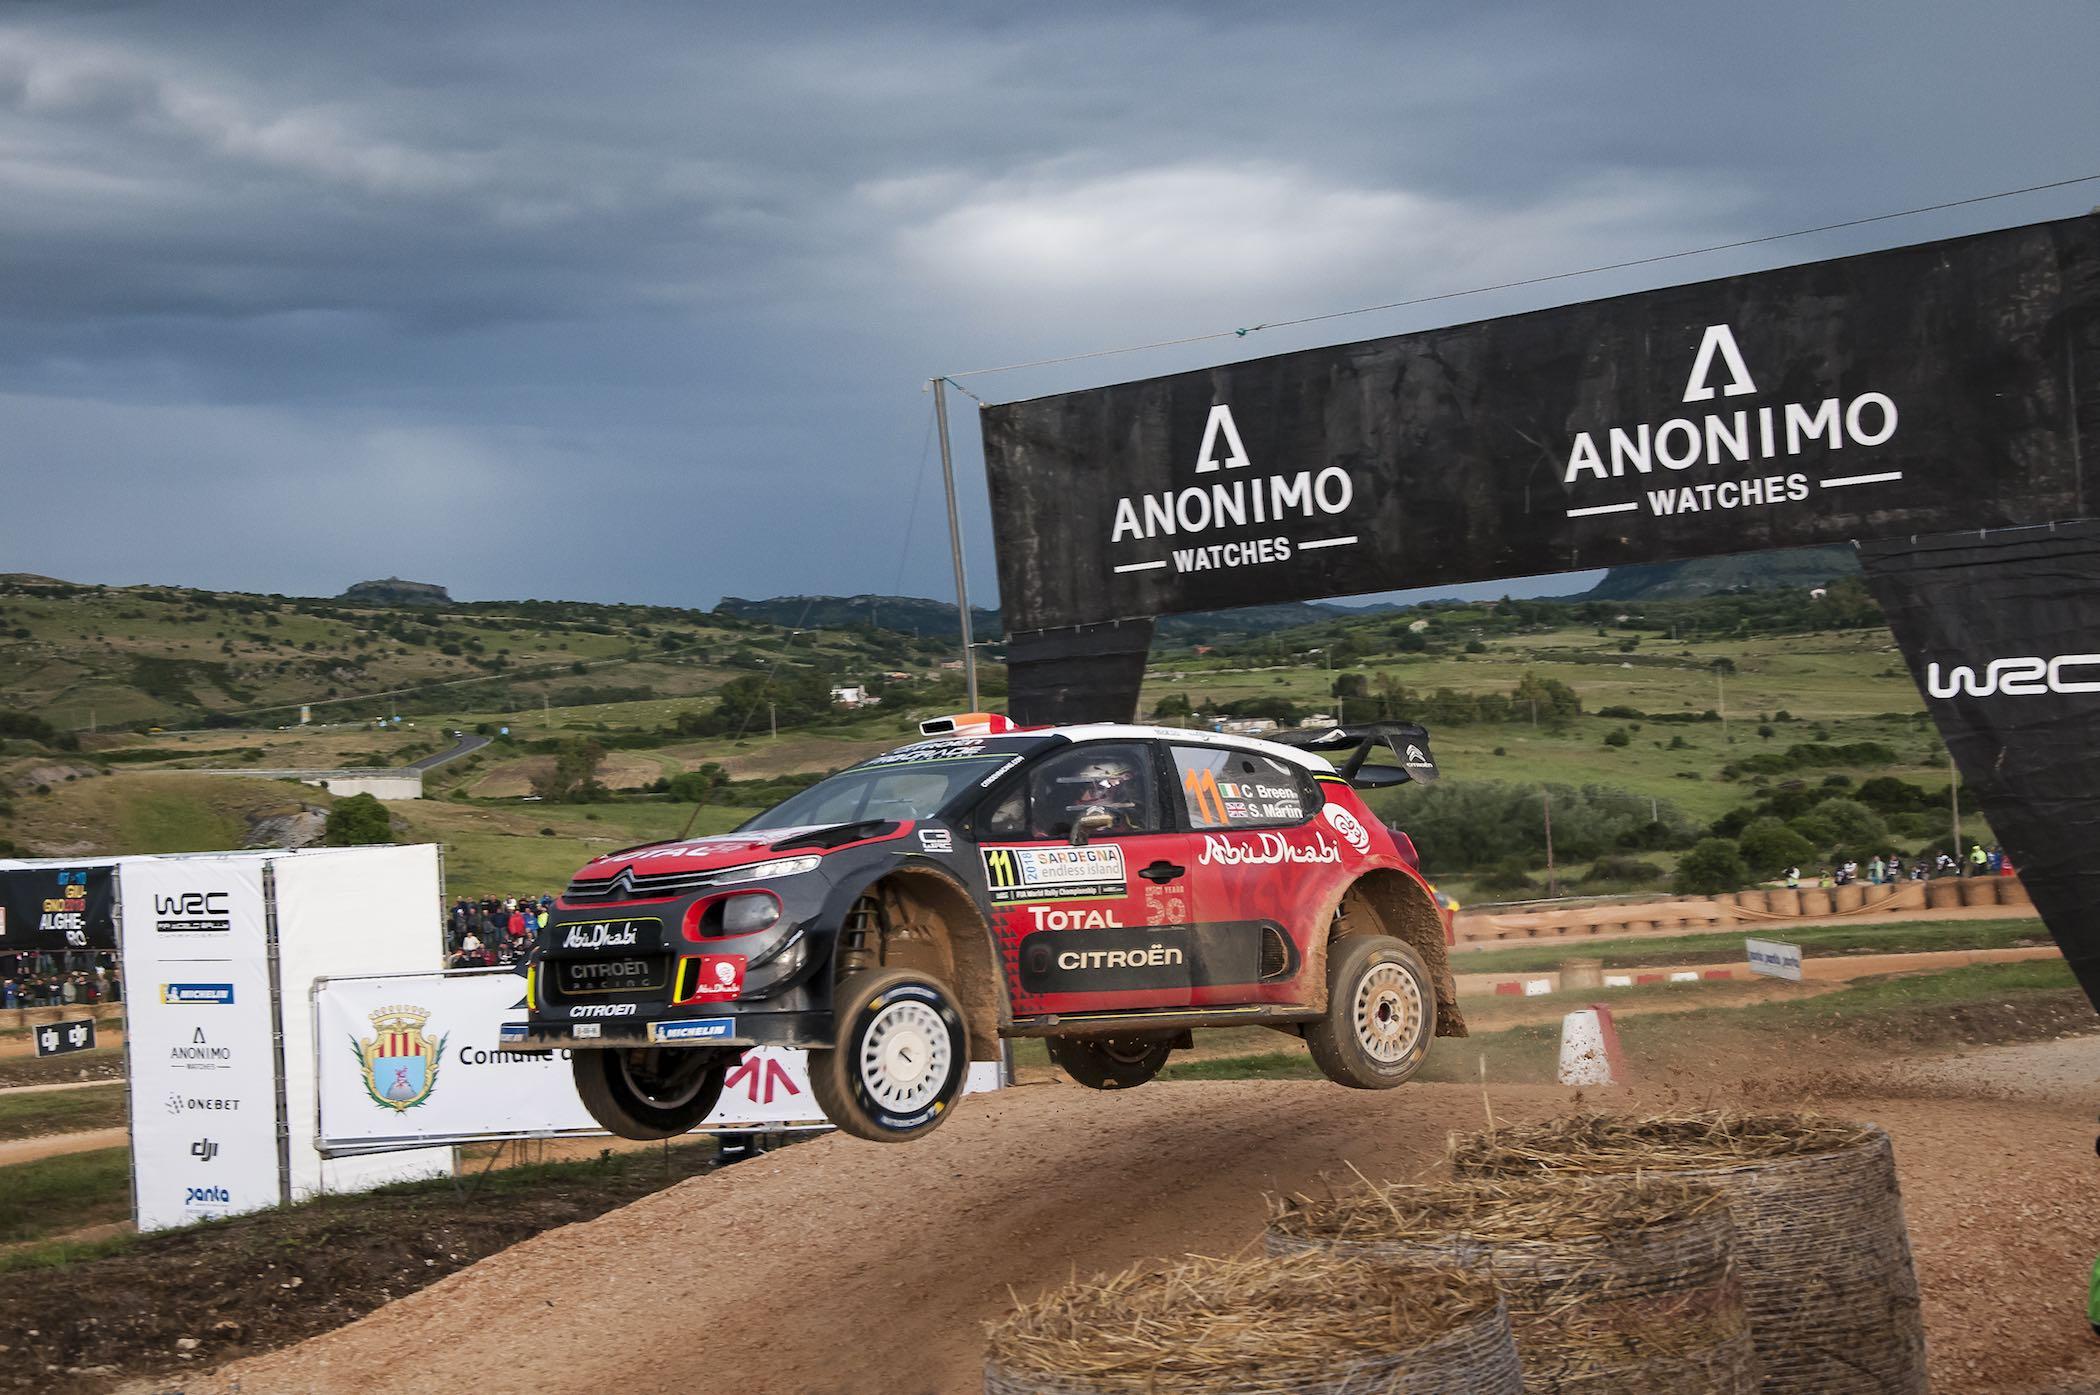 ANONIMO-Official-Timekeeper-WRC-Sardinia-2